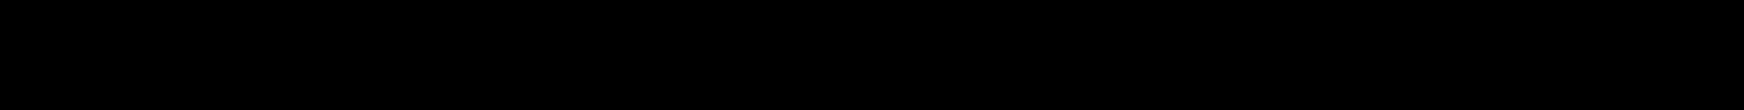 MetaScOffcPro-NormIta.ttf